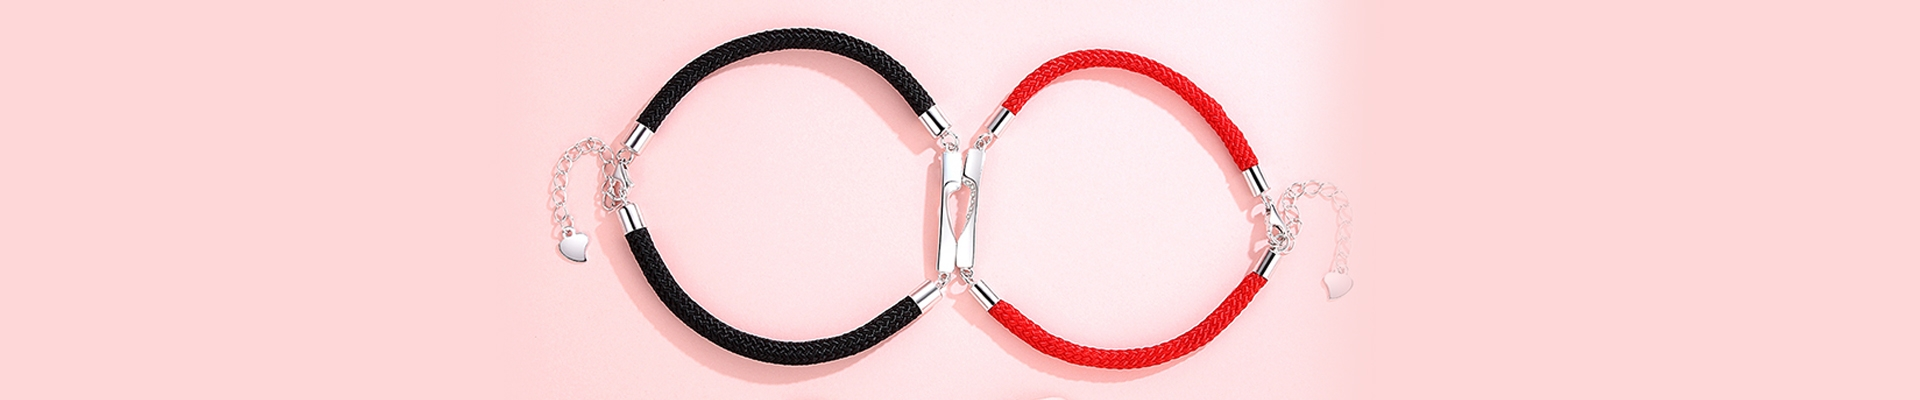 Urcoco Bracelets